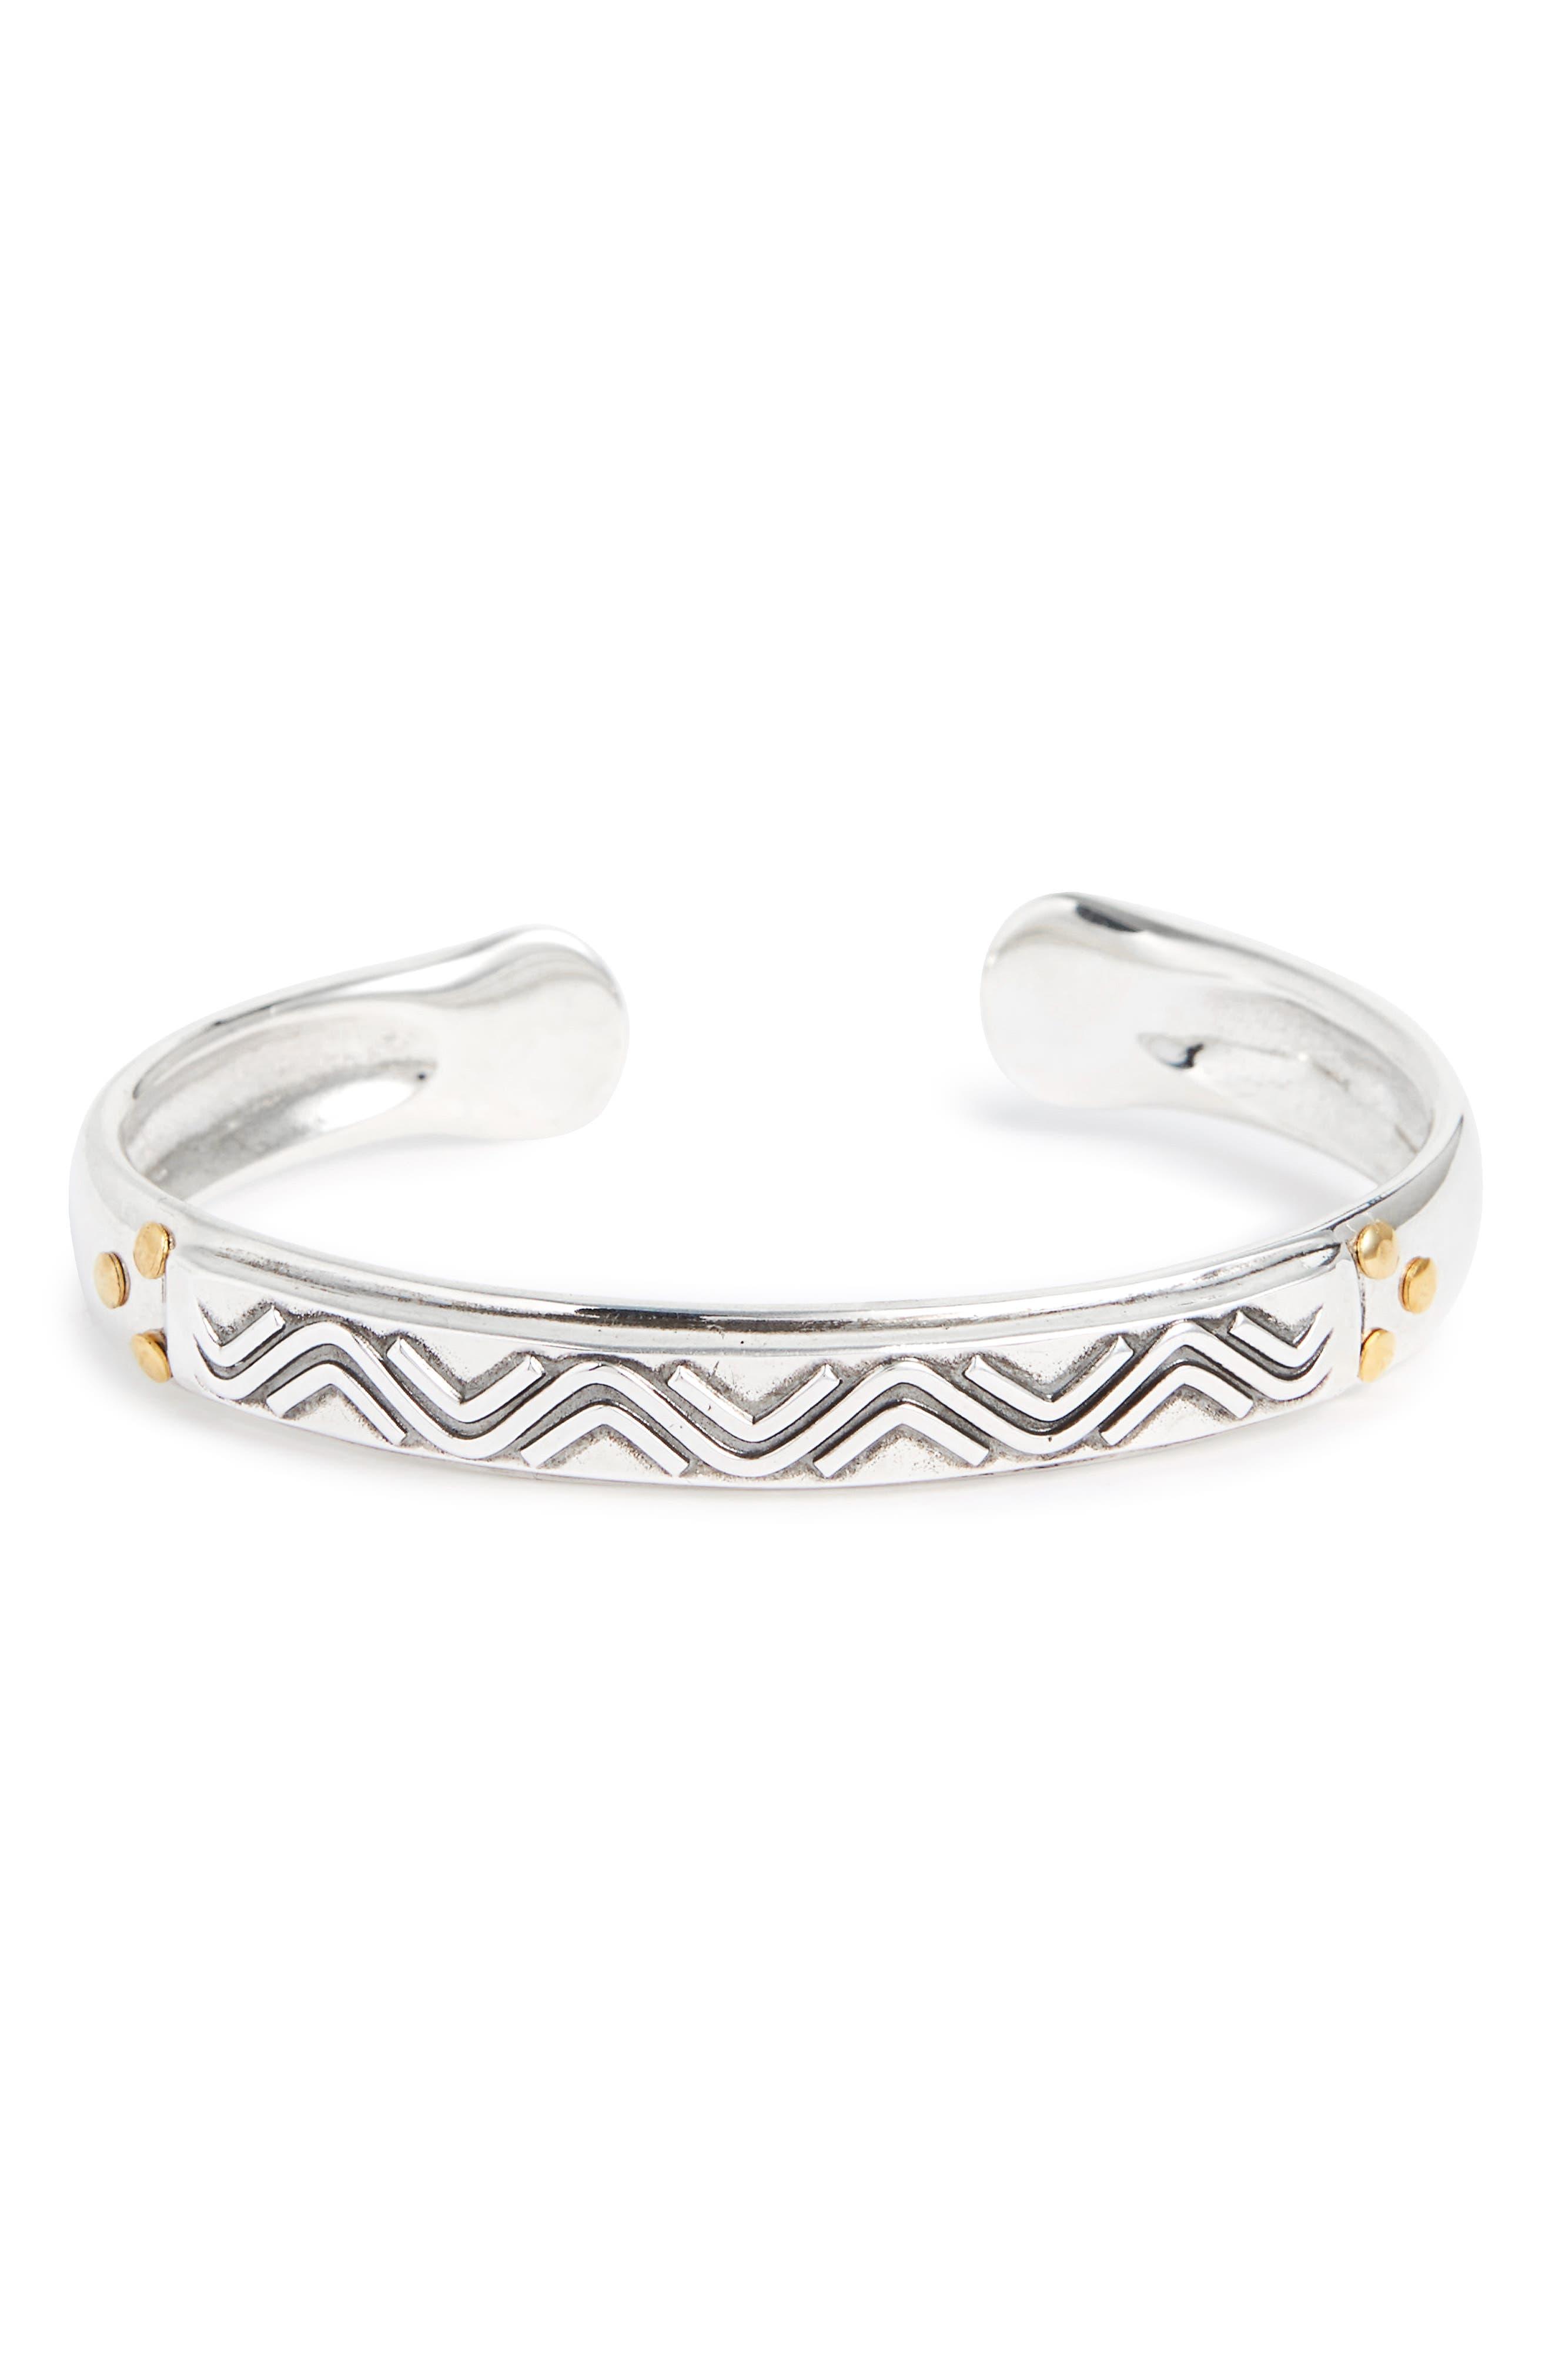 Matis Cuff Bracelet,                         Main,                         color, Silver